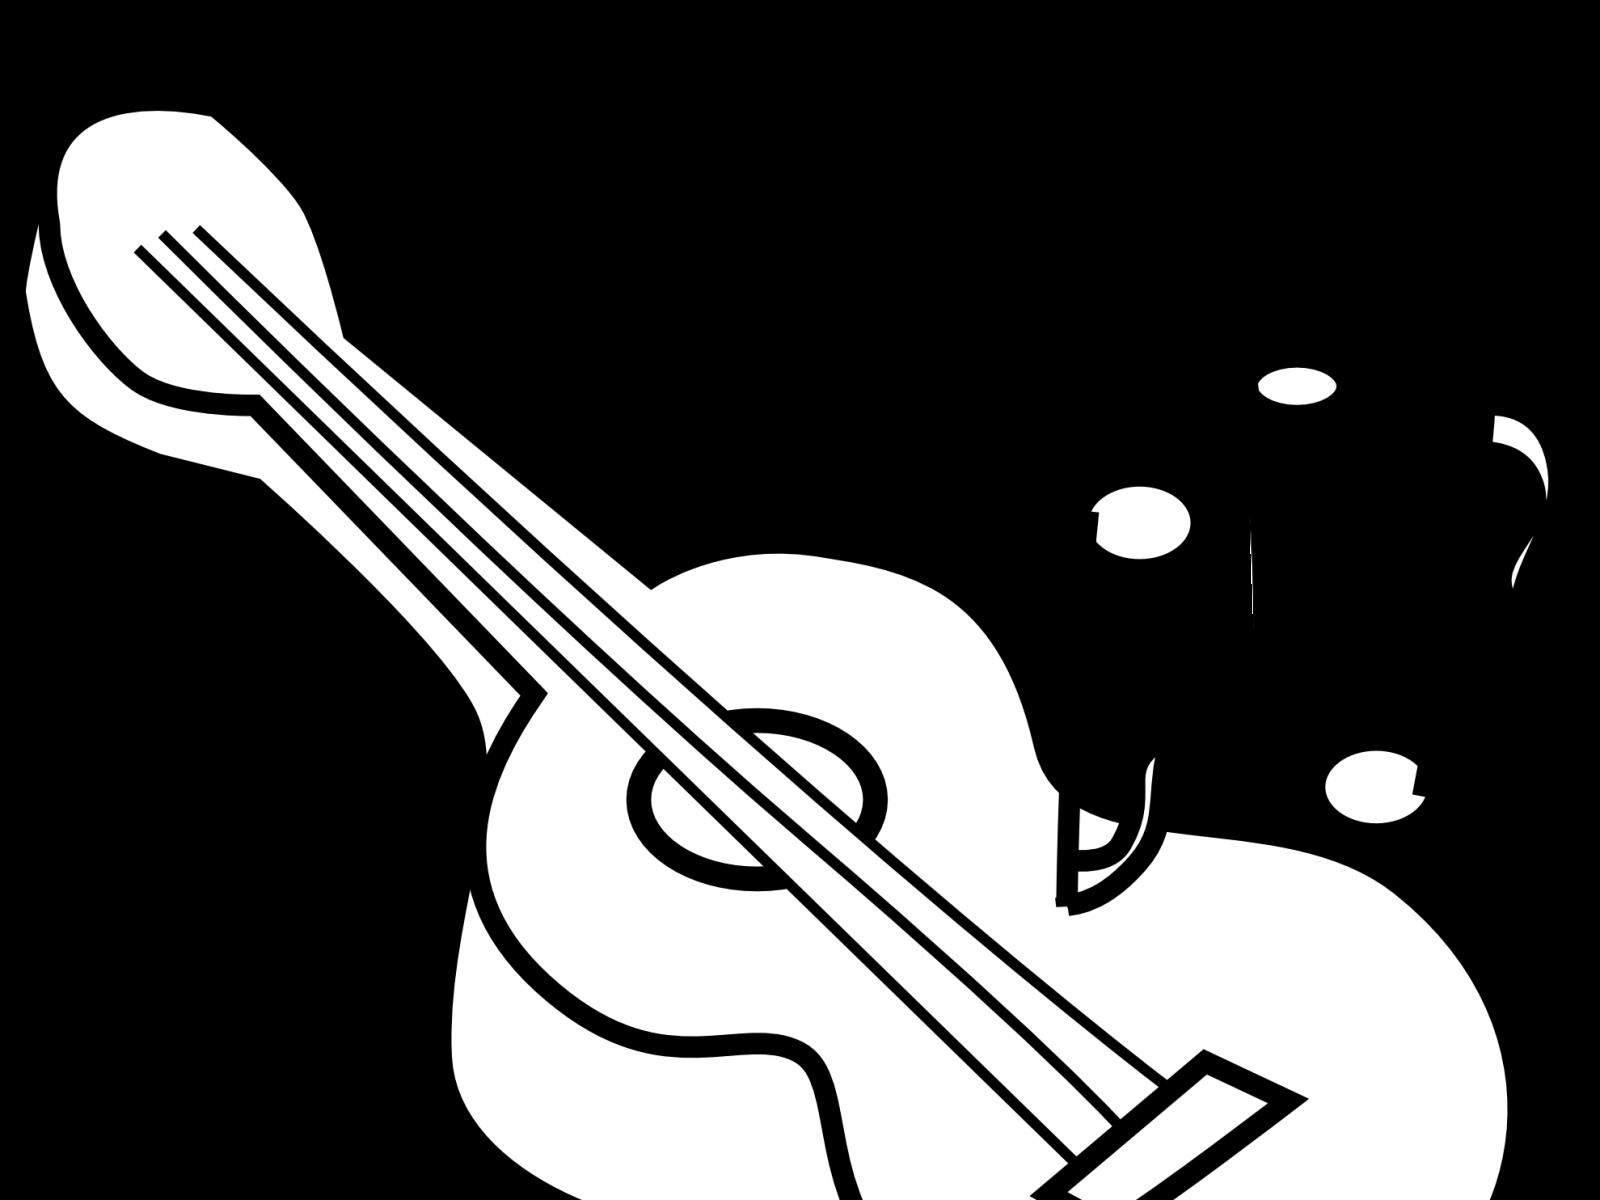 Line drawing at getdrawings. Clipart guitar coloring